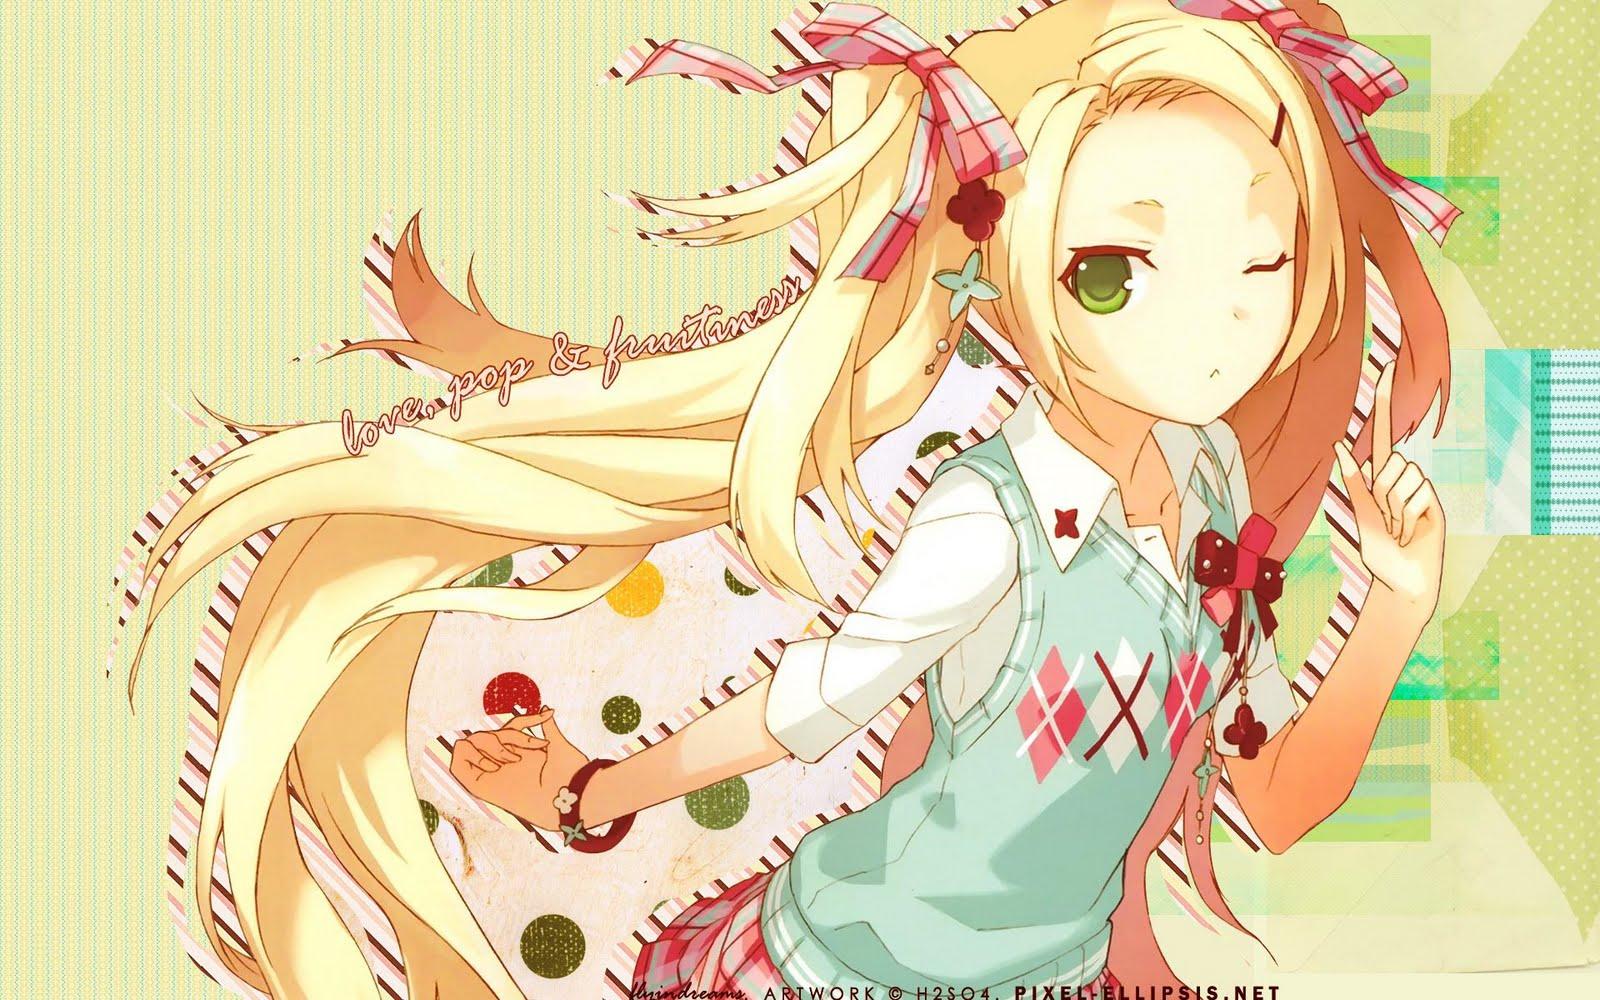 Island Of Horizon Wallpapers Anime Hq Island Of Horizon Pictures